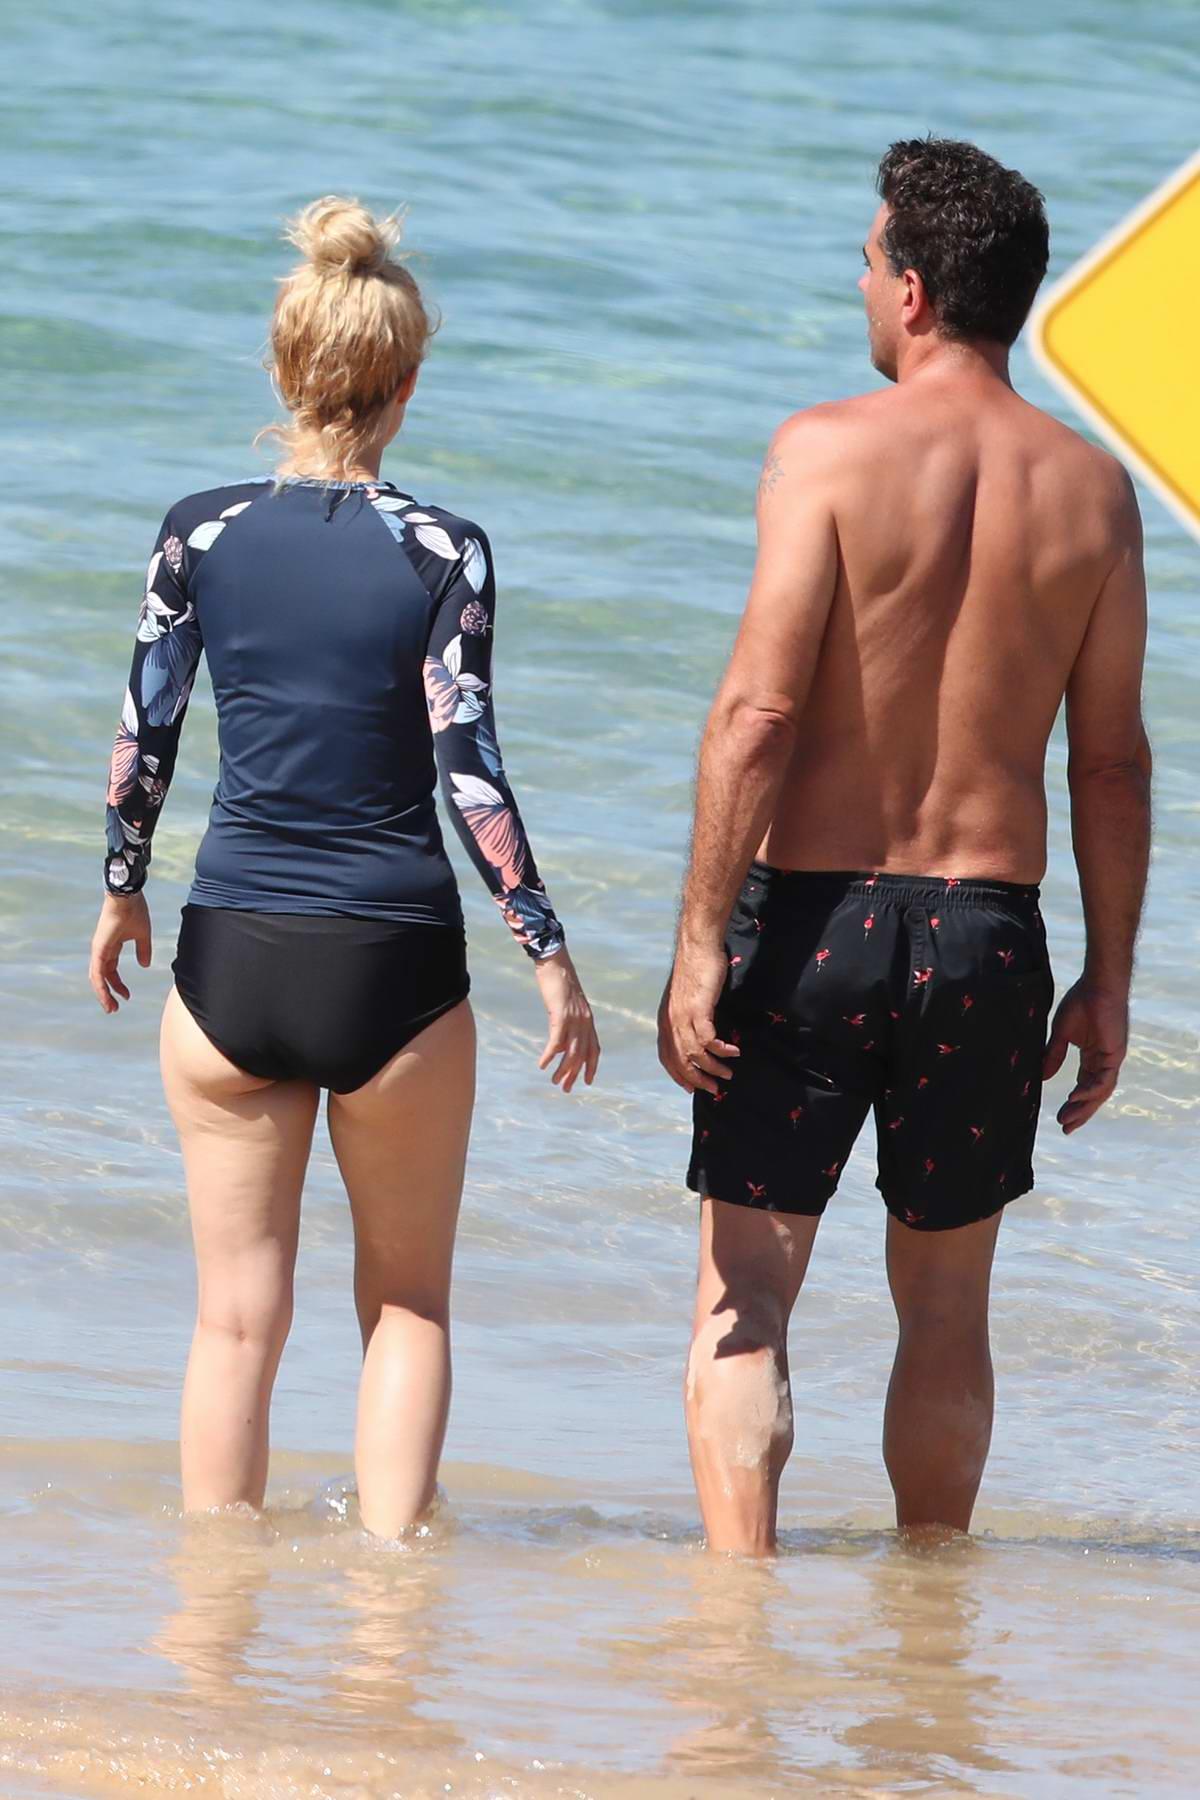 rose byrne seen wearing a black bikini during a beach day